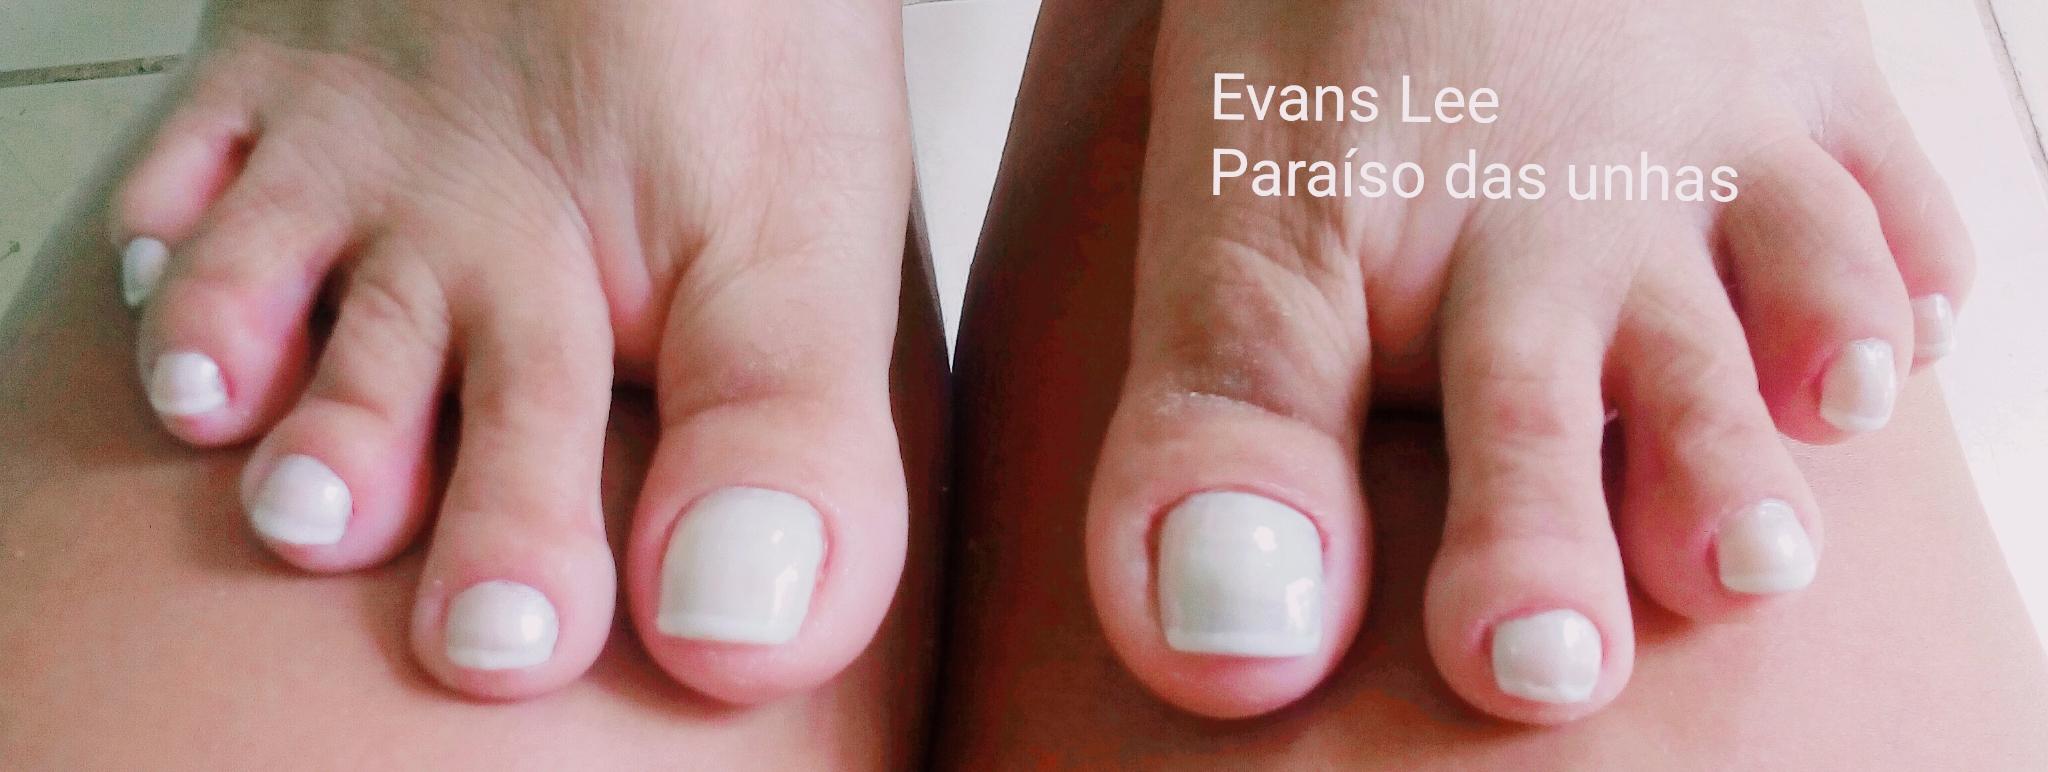 estética manicure e pedicure assistente maquiador(a)